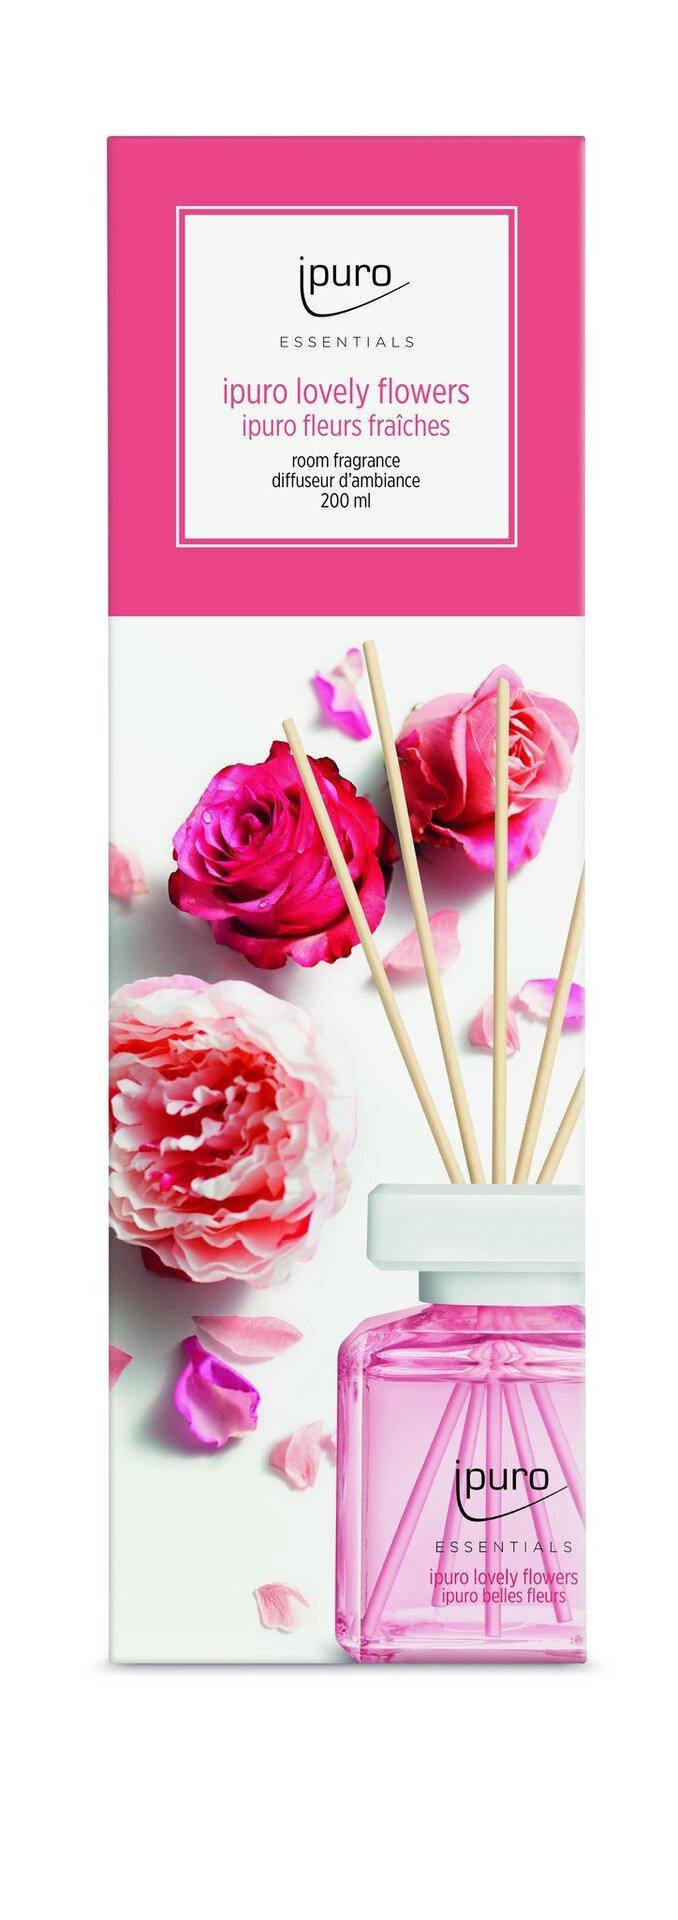 Raumduft lovely flowers ipuro Kunststoff